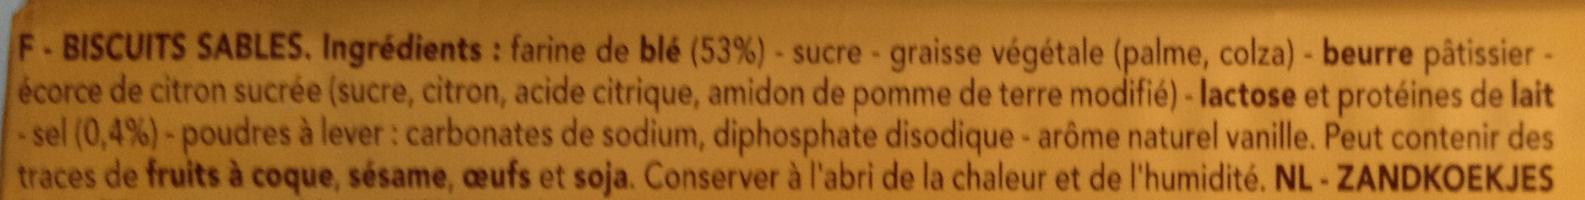 Delacre sprits original - Ingrediënten - fr